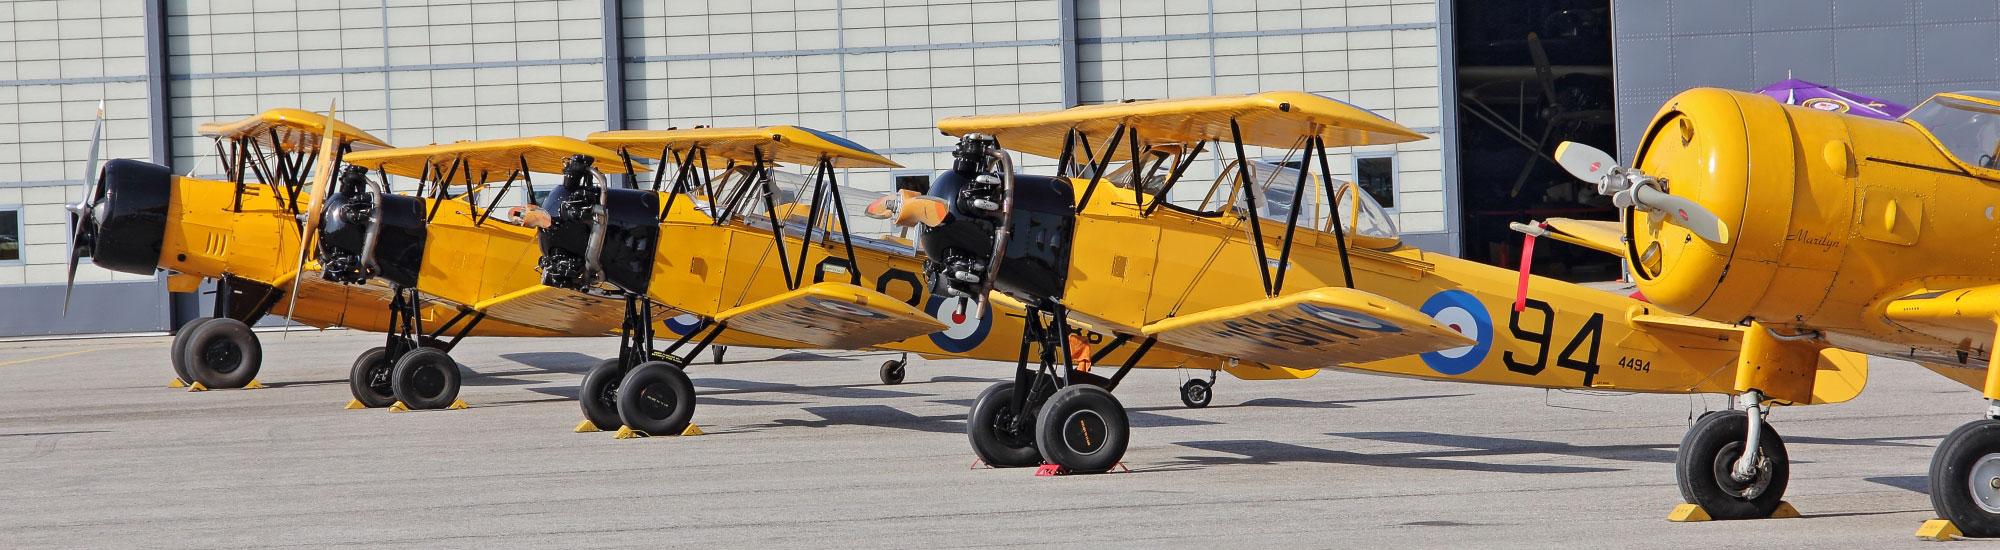 Aircraft at Canadian Warplane Heritage Museum